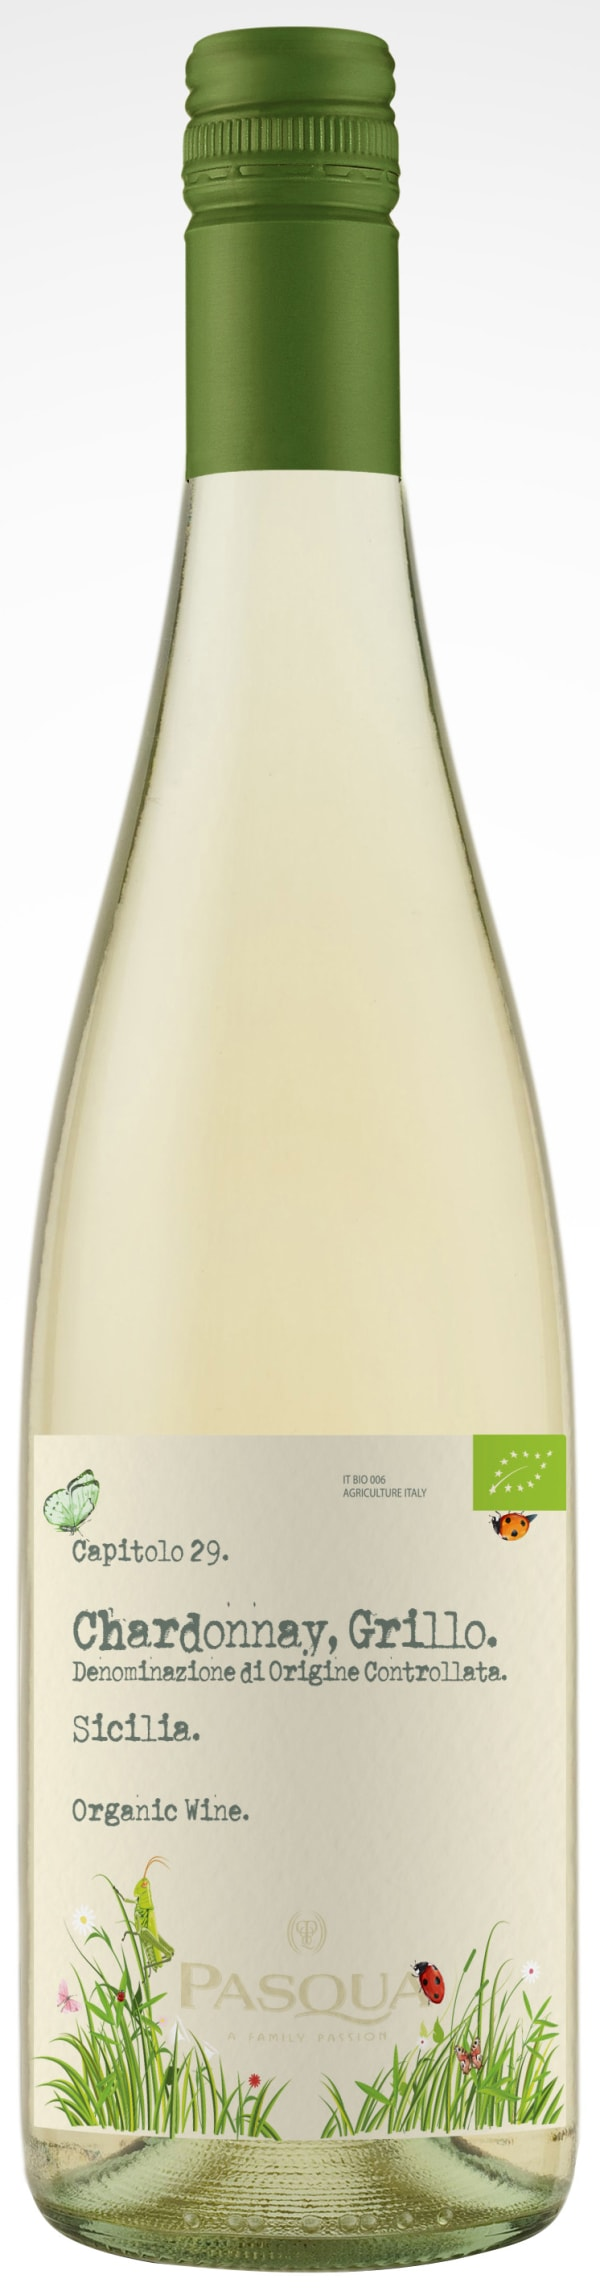 Pasqua Chardonnay Grillo Organic 2015